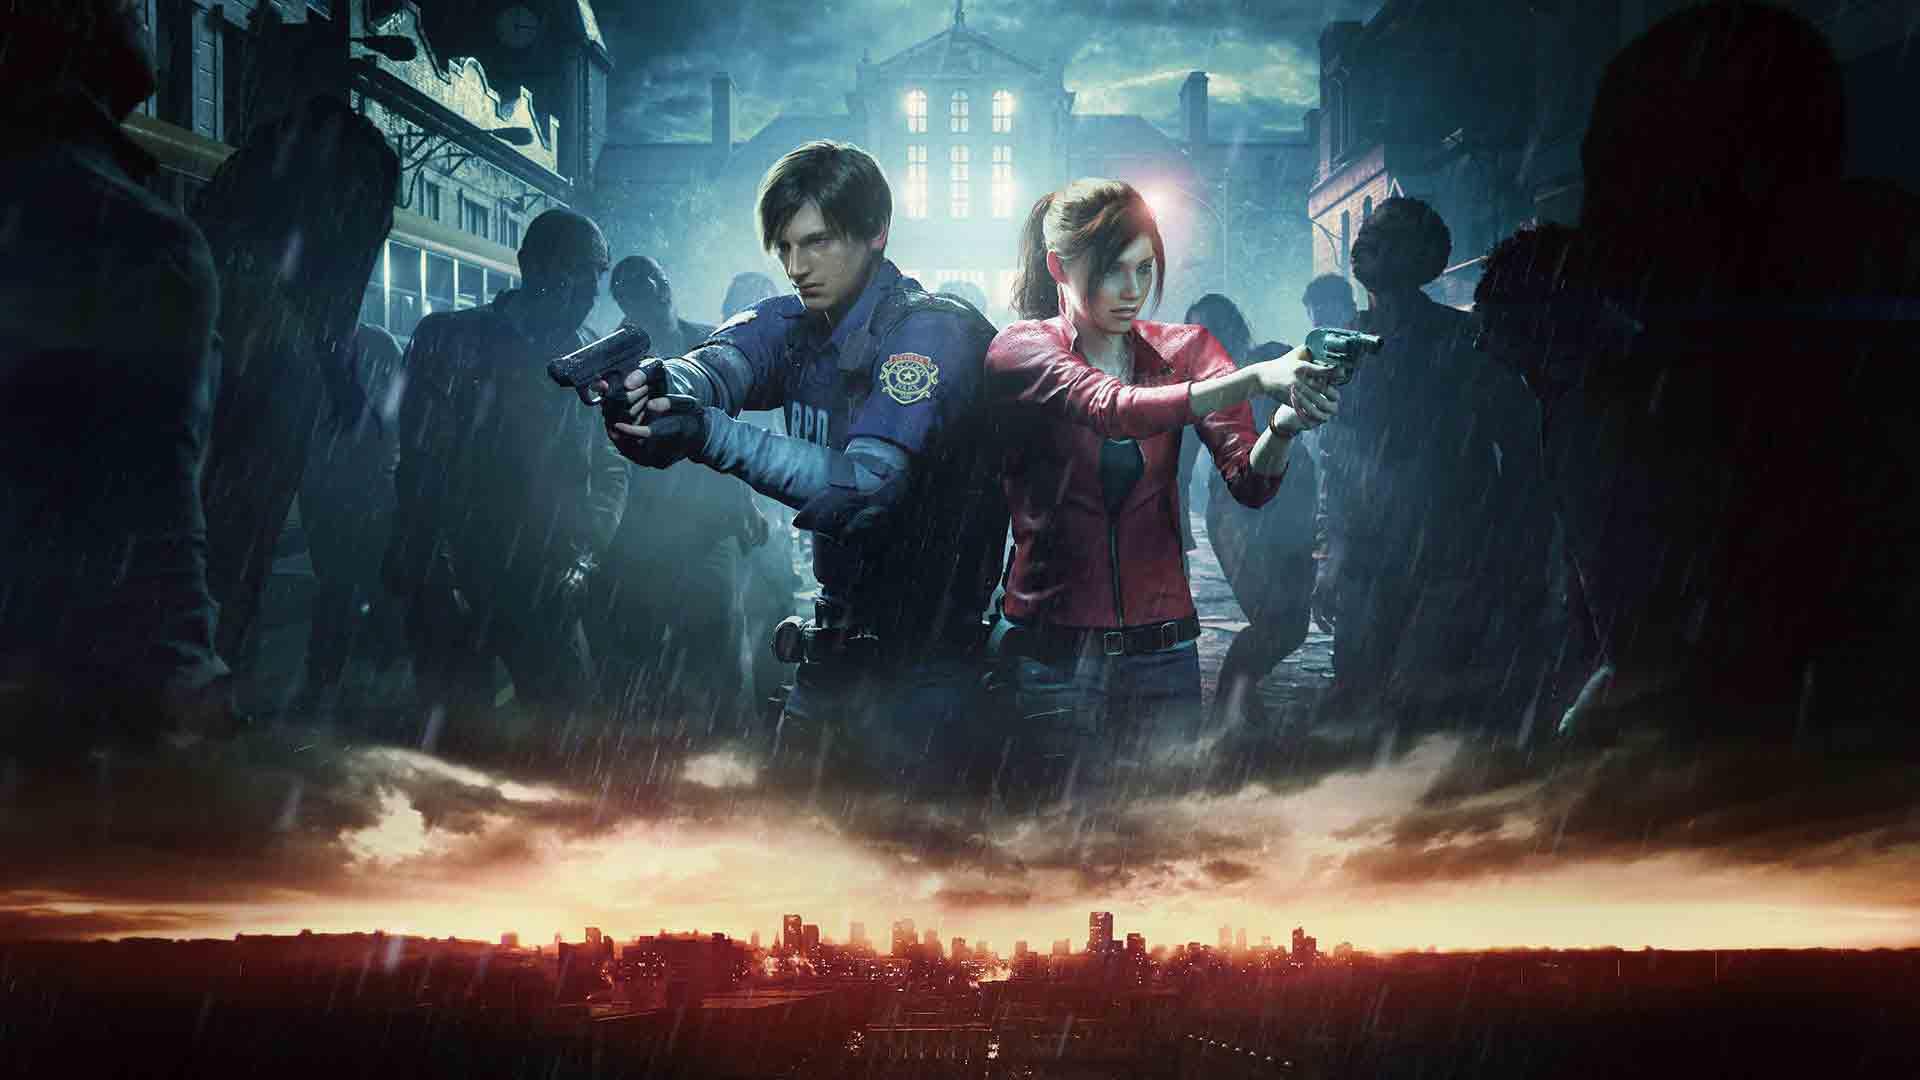 Resident evil 2 survivor playstation zombies videogames 01